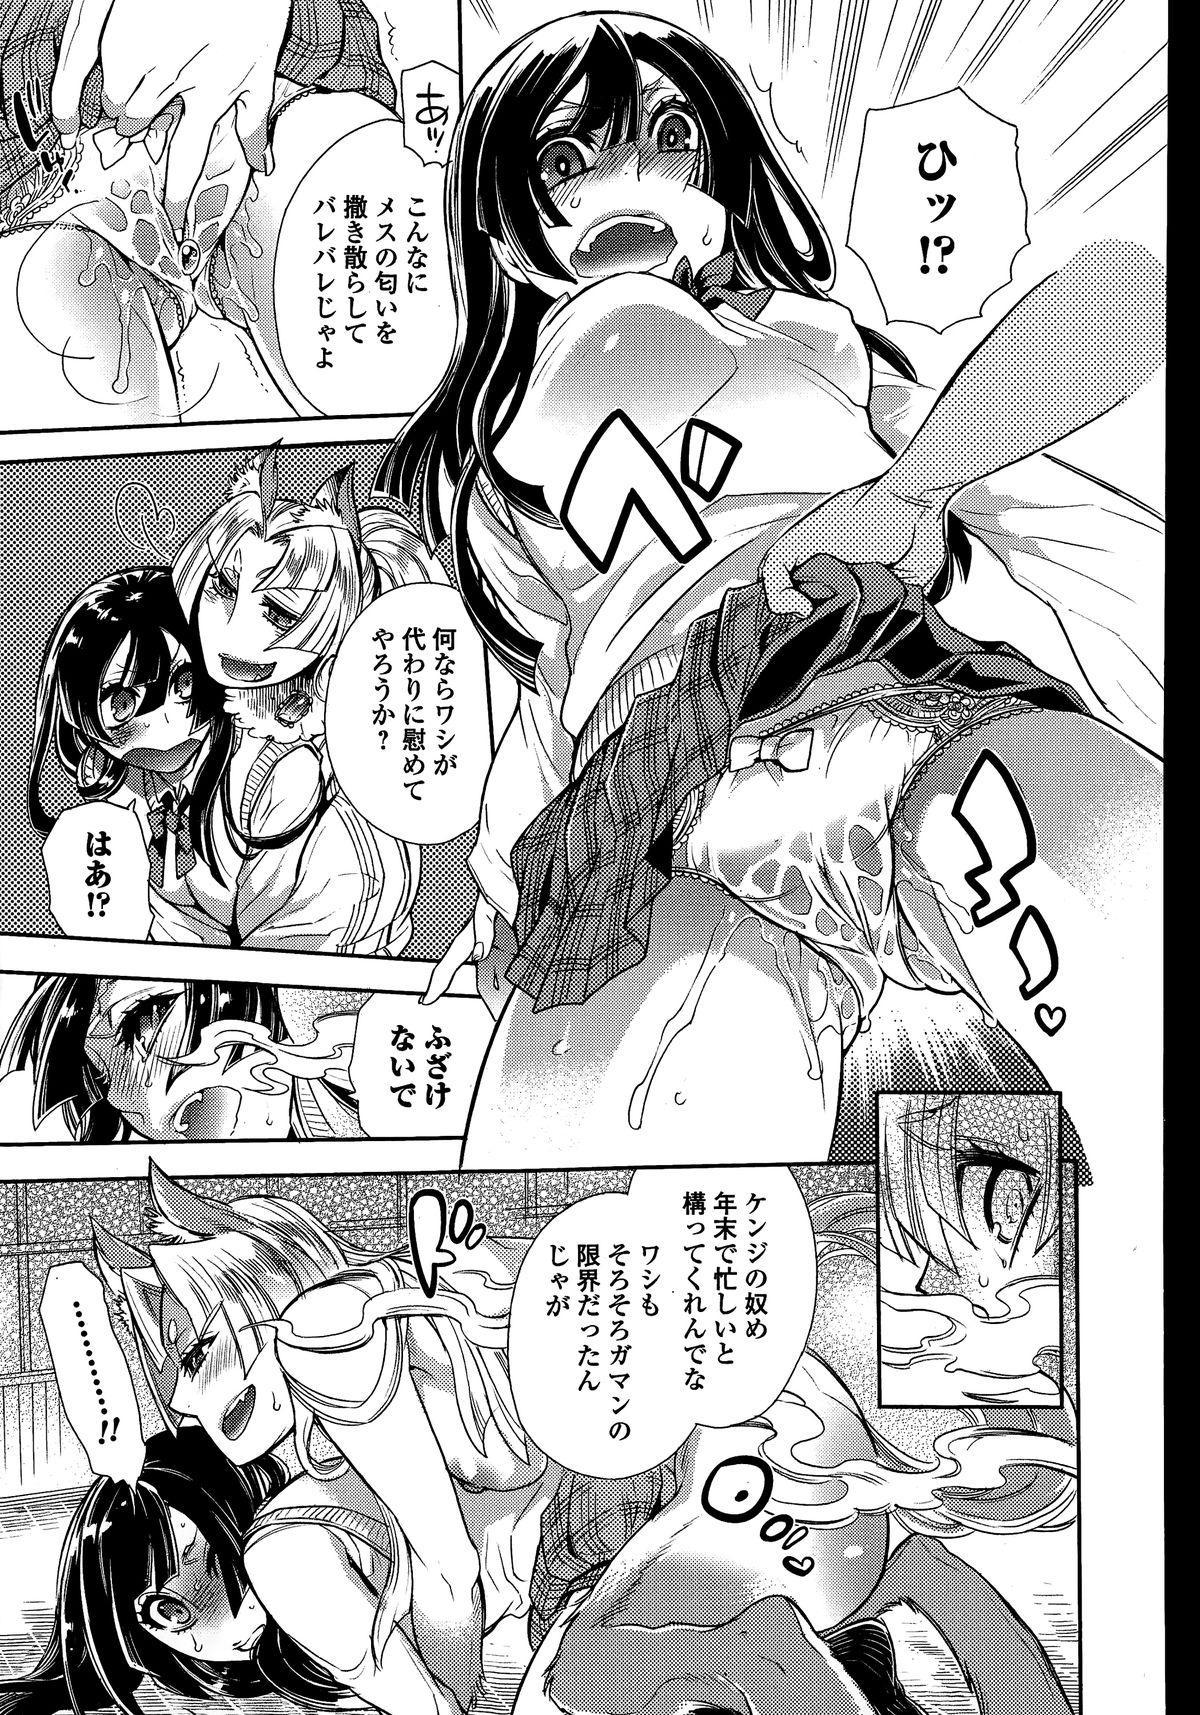 Comic Toutetsu 2015-02 Vol. 3 224